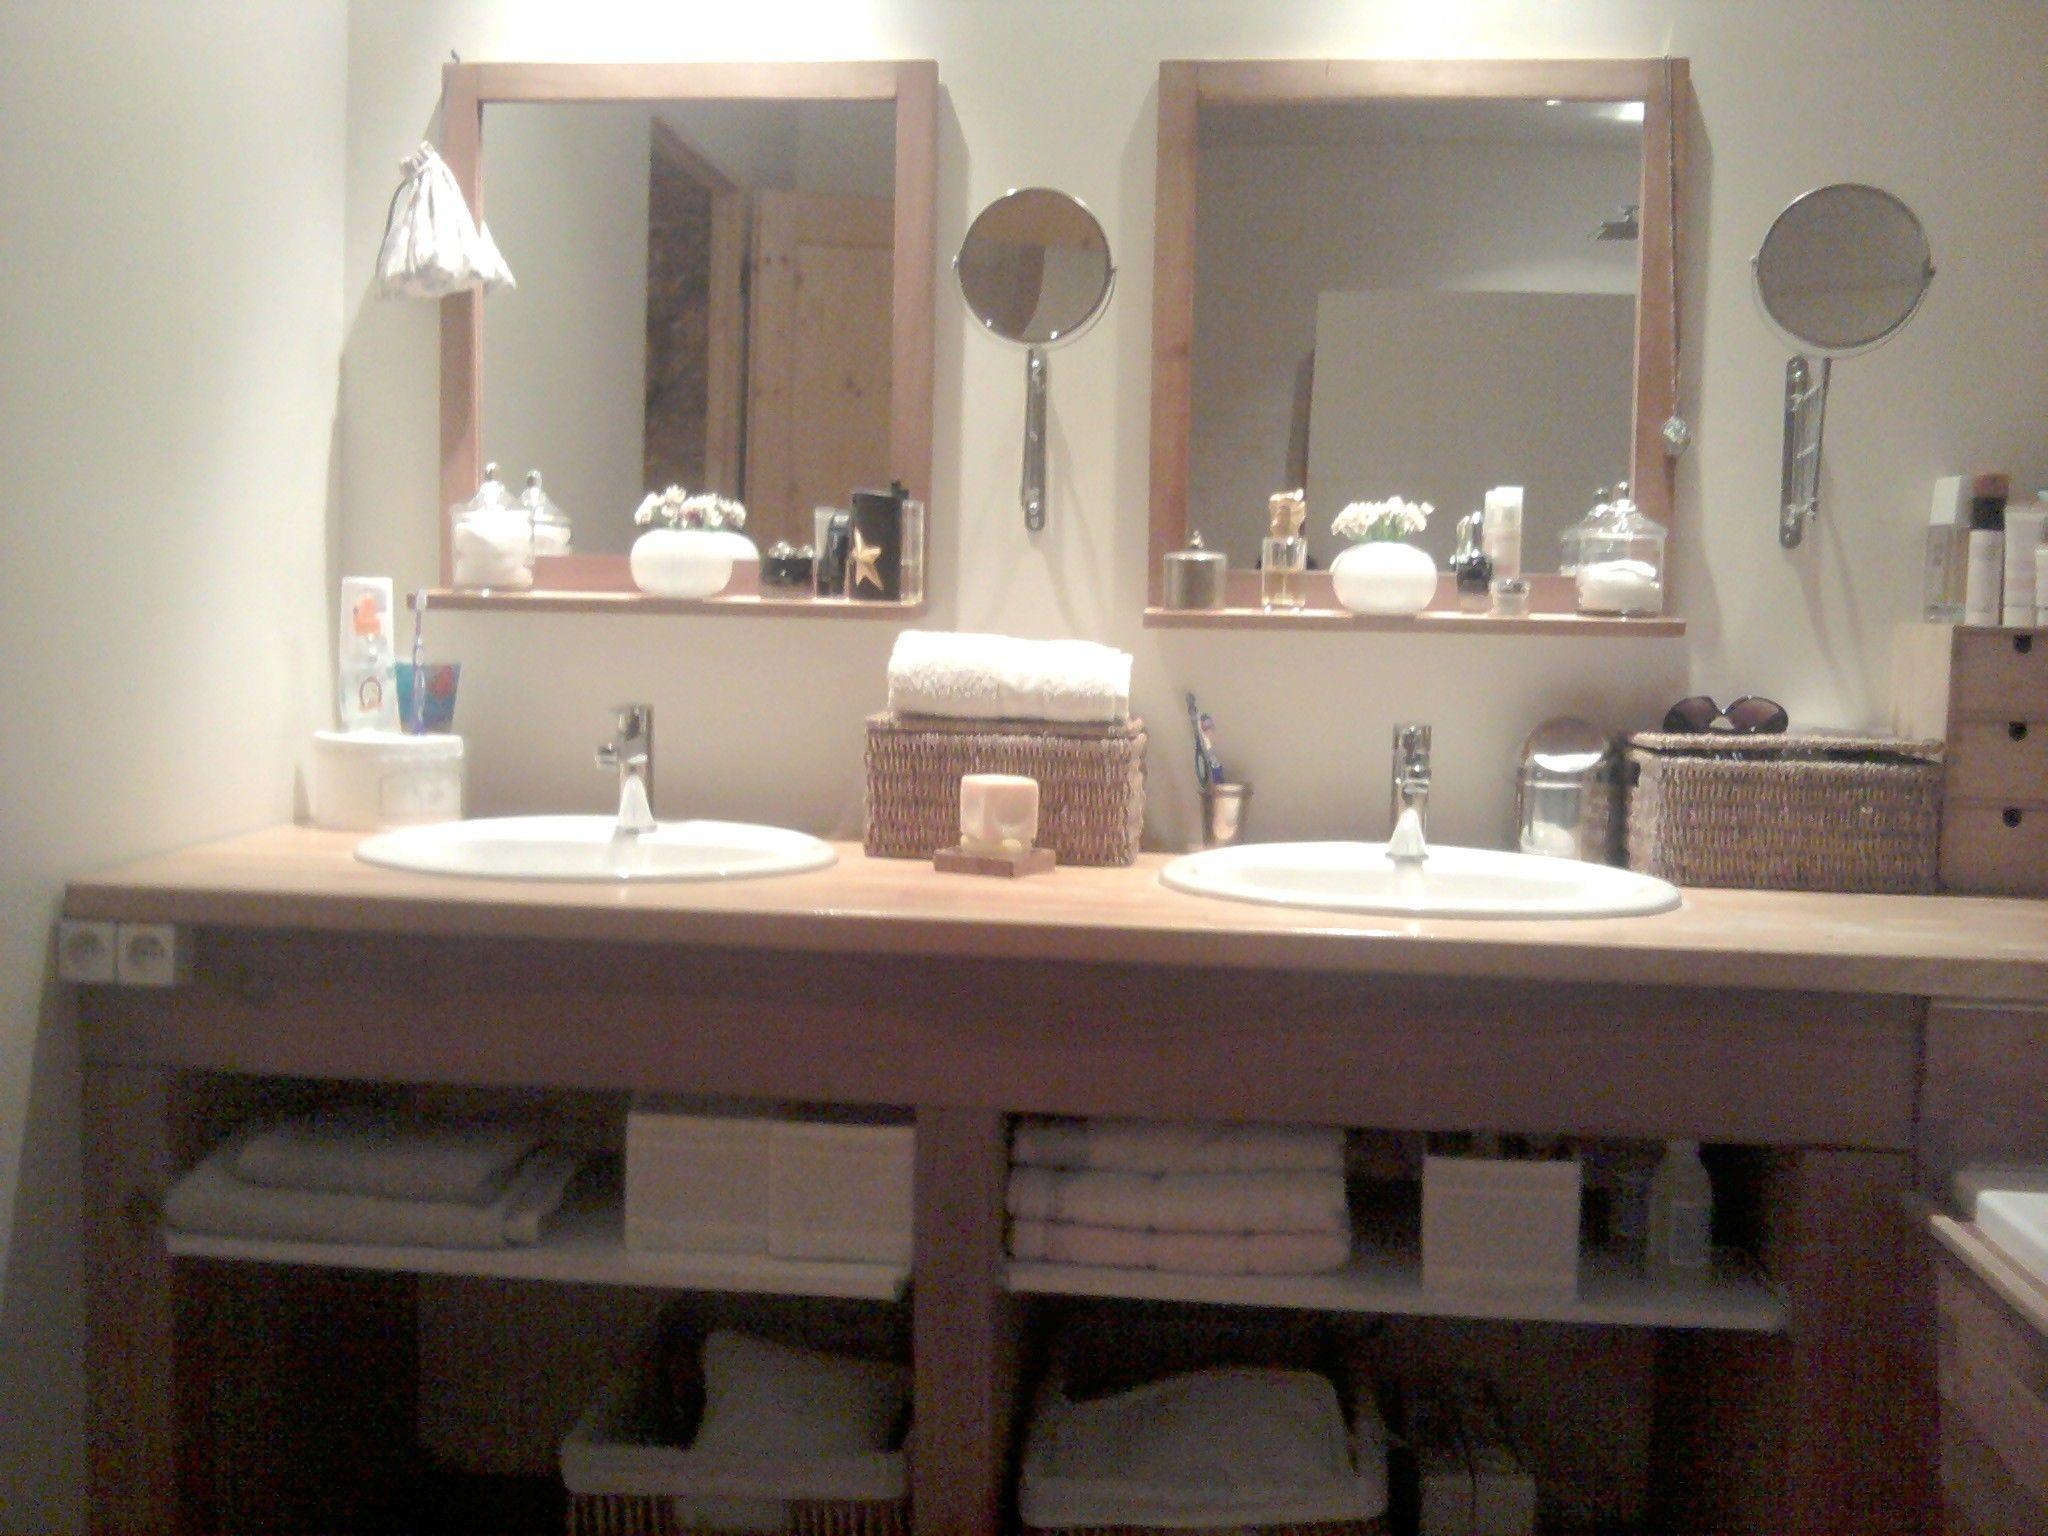 stela personalshopper elle beauty bathroom